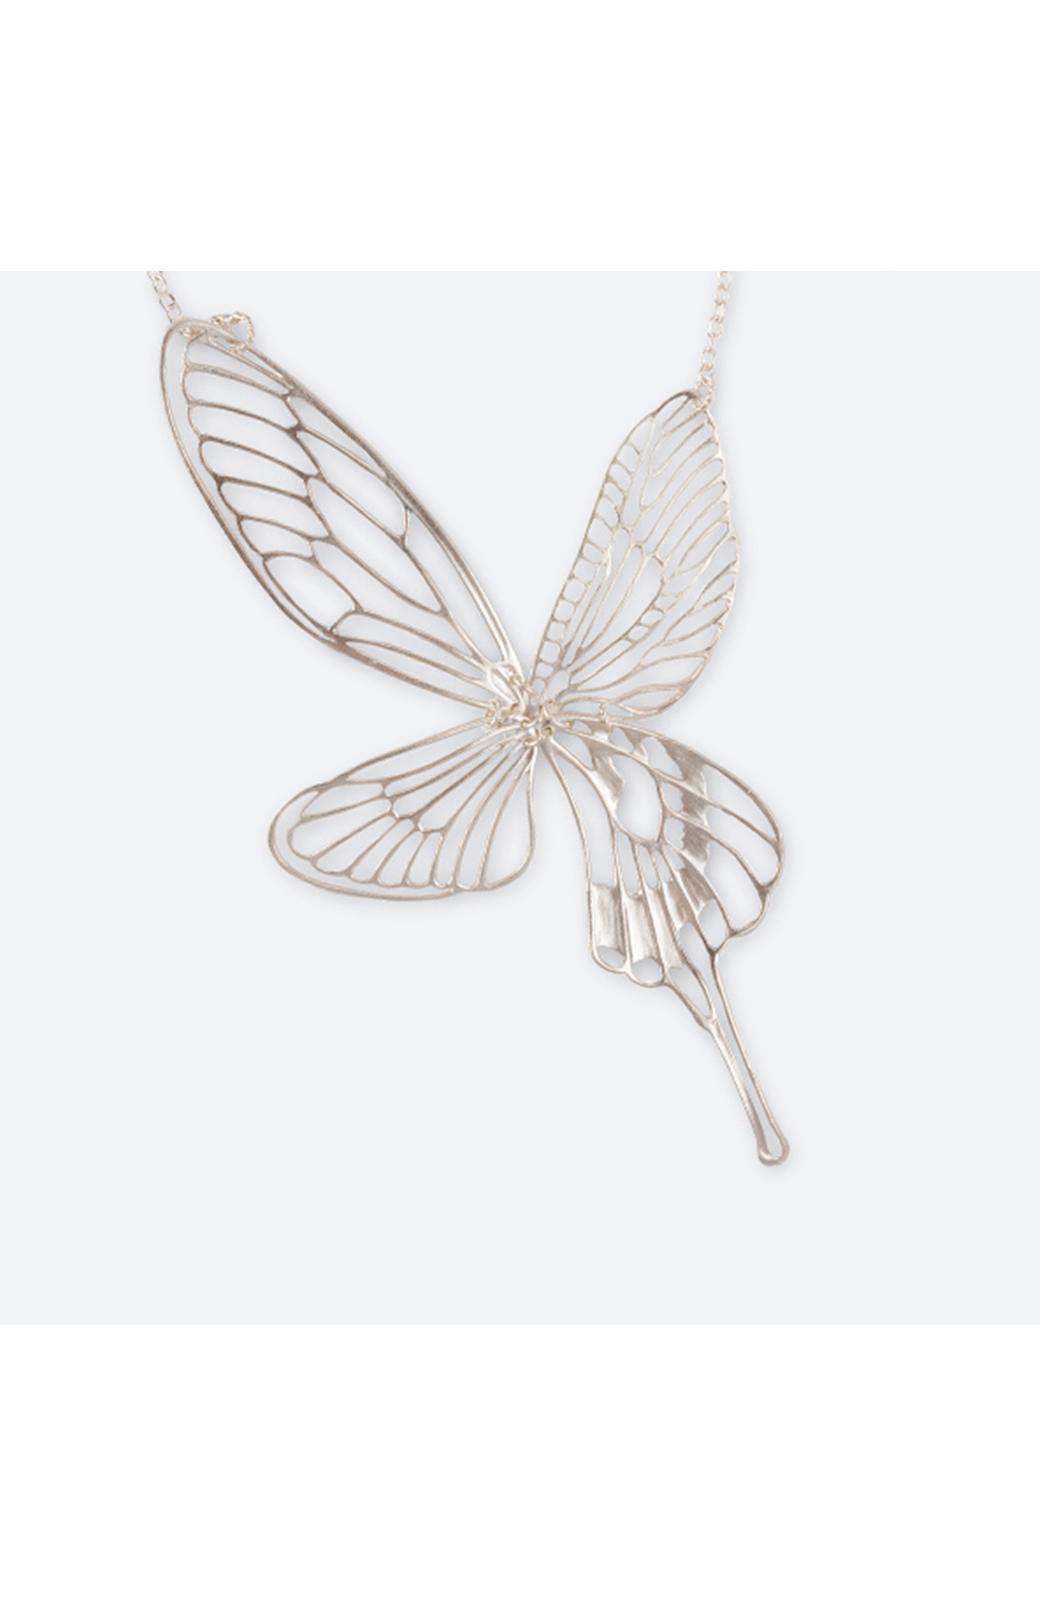 haco! てとひとて MARZO DERICATE AIR 昆虫の羽シルバーネックレス <シルバー>の商品写真4